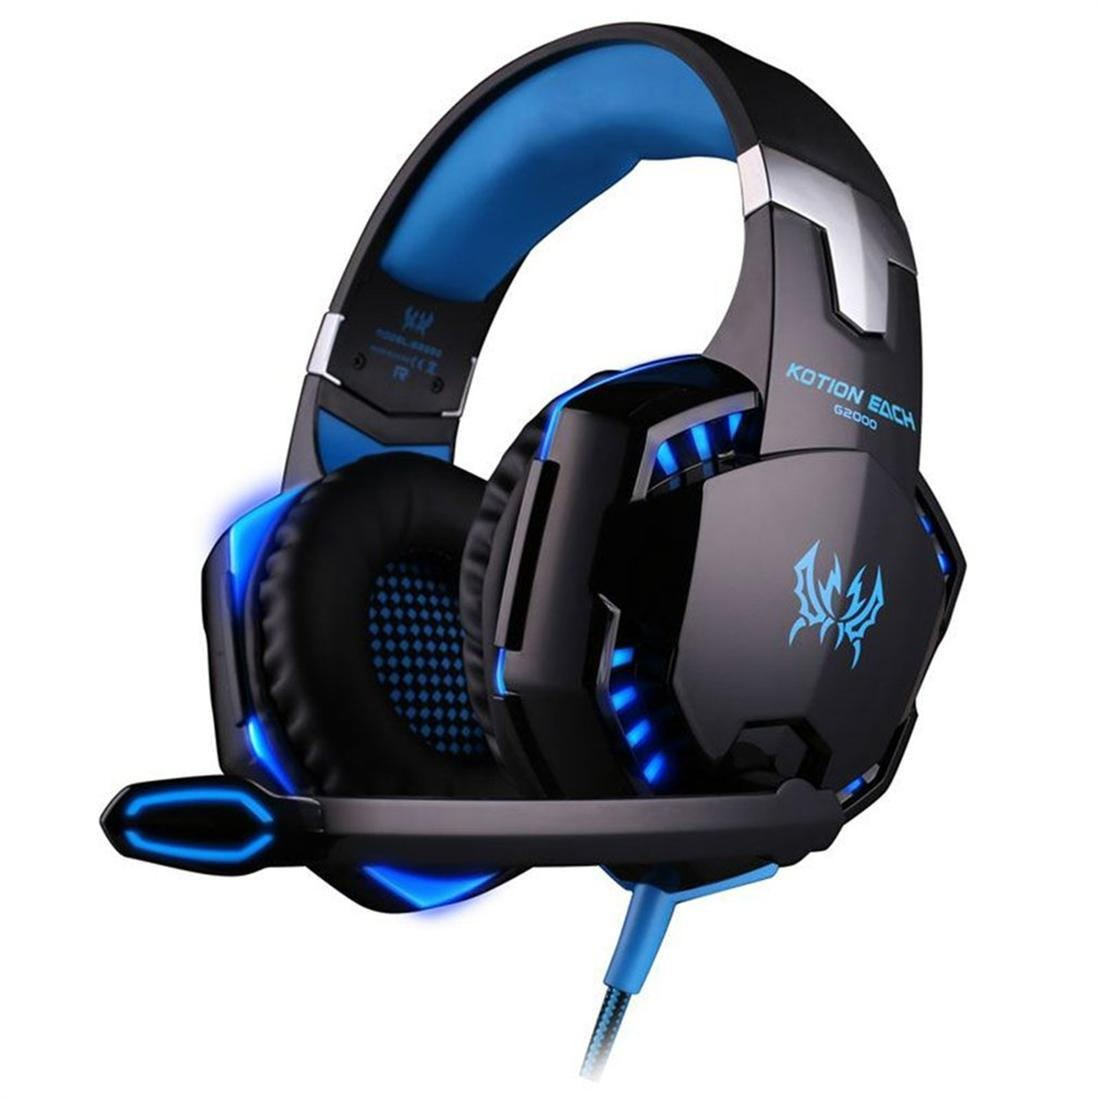 G2000 Lightweight Ergonomic Design Gaming Headset Luminous Headphones With Mic